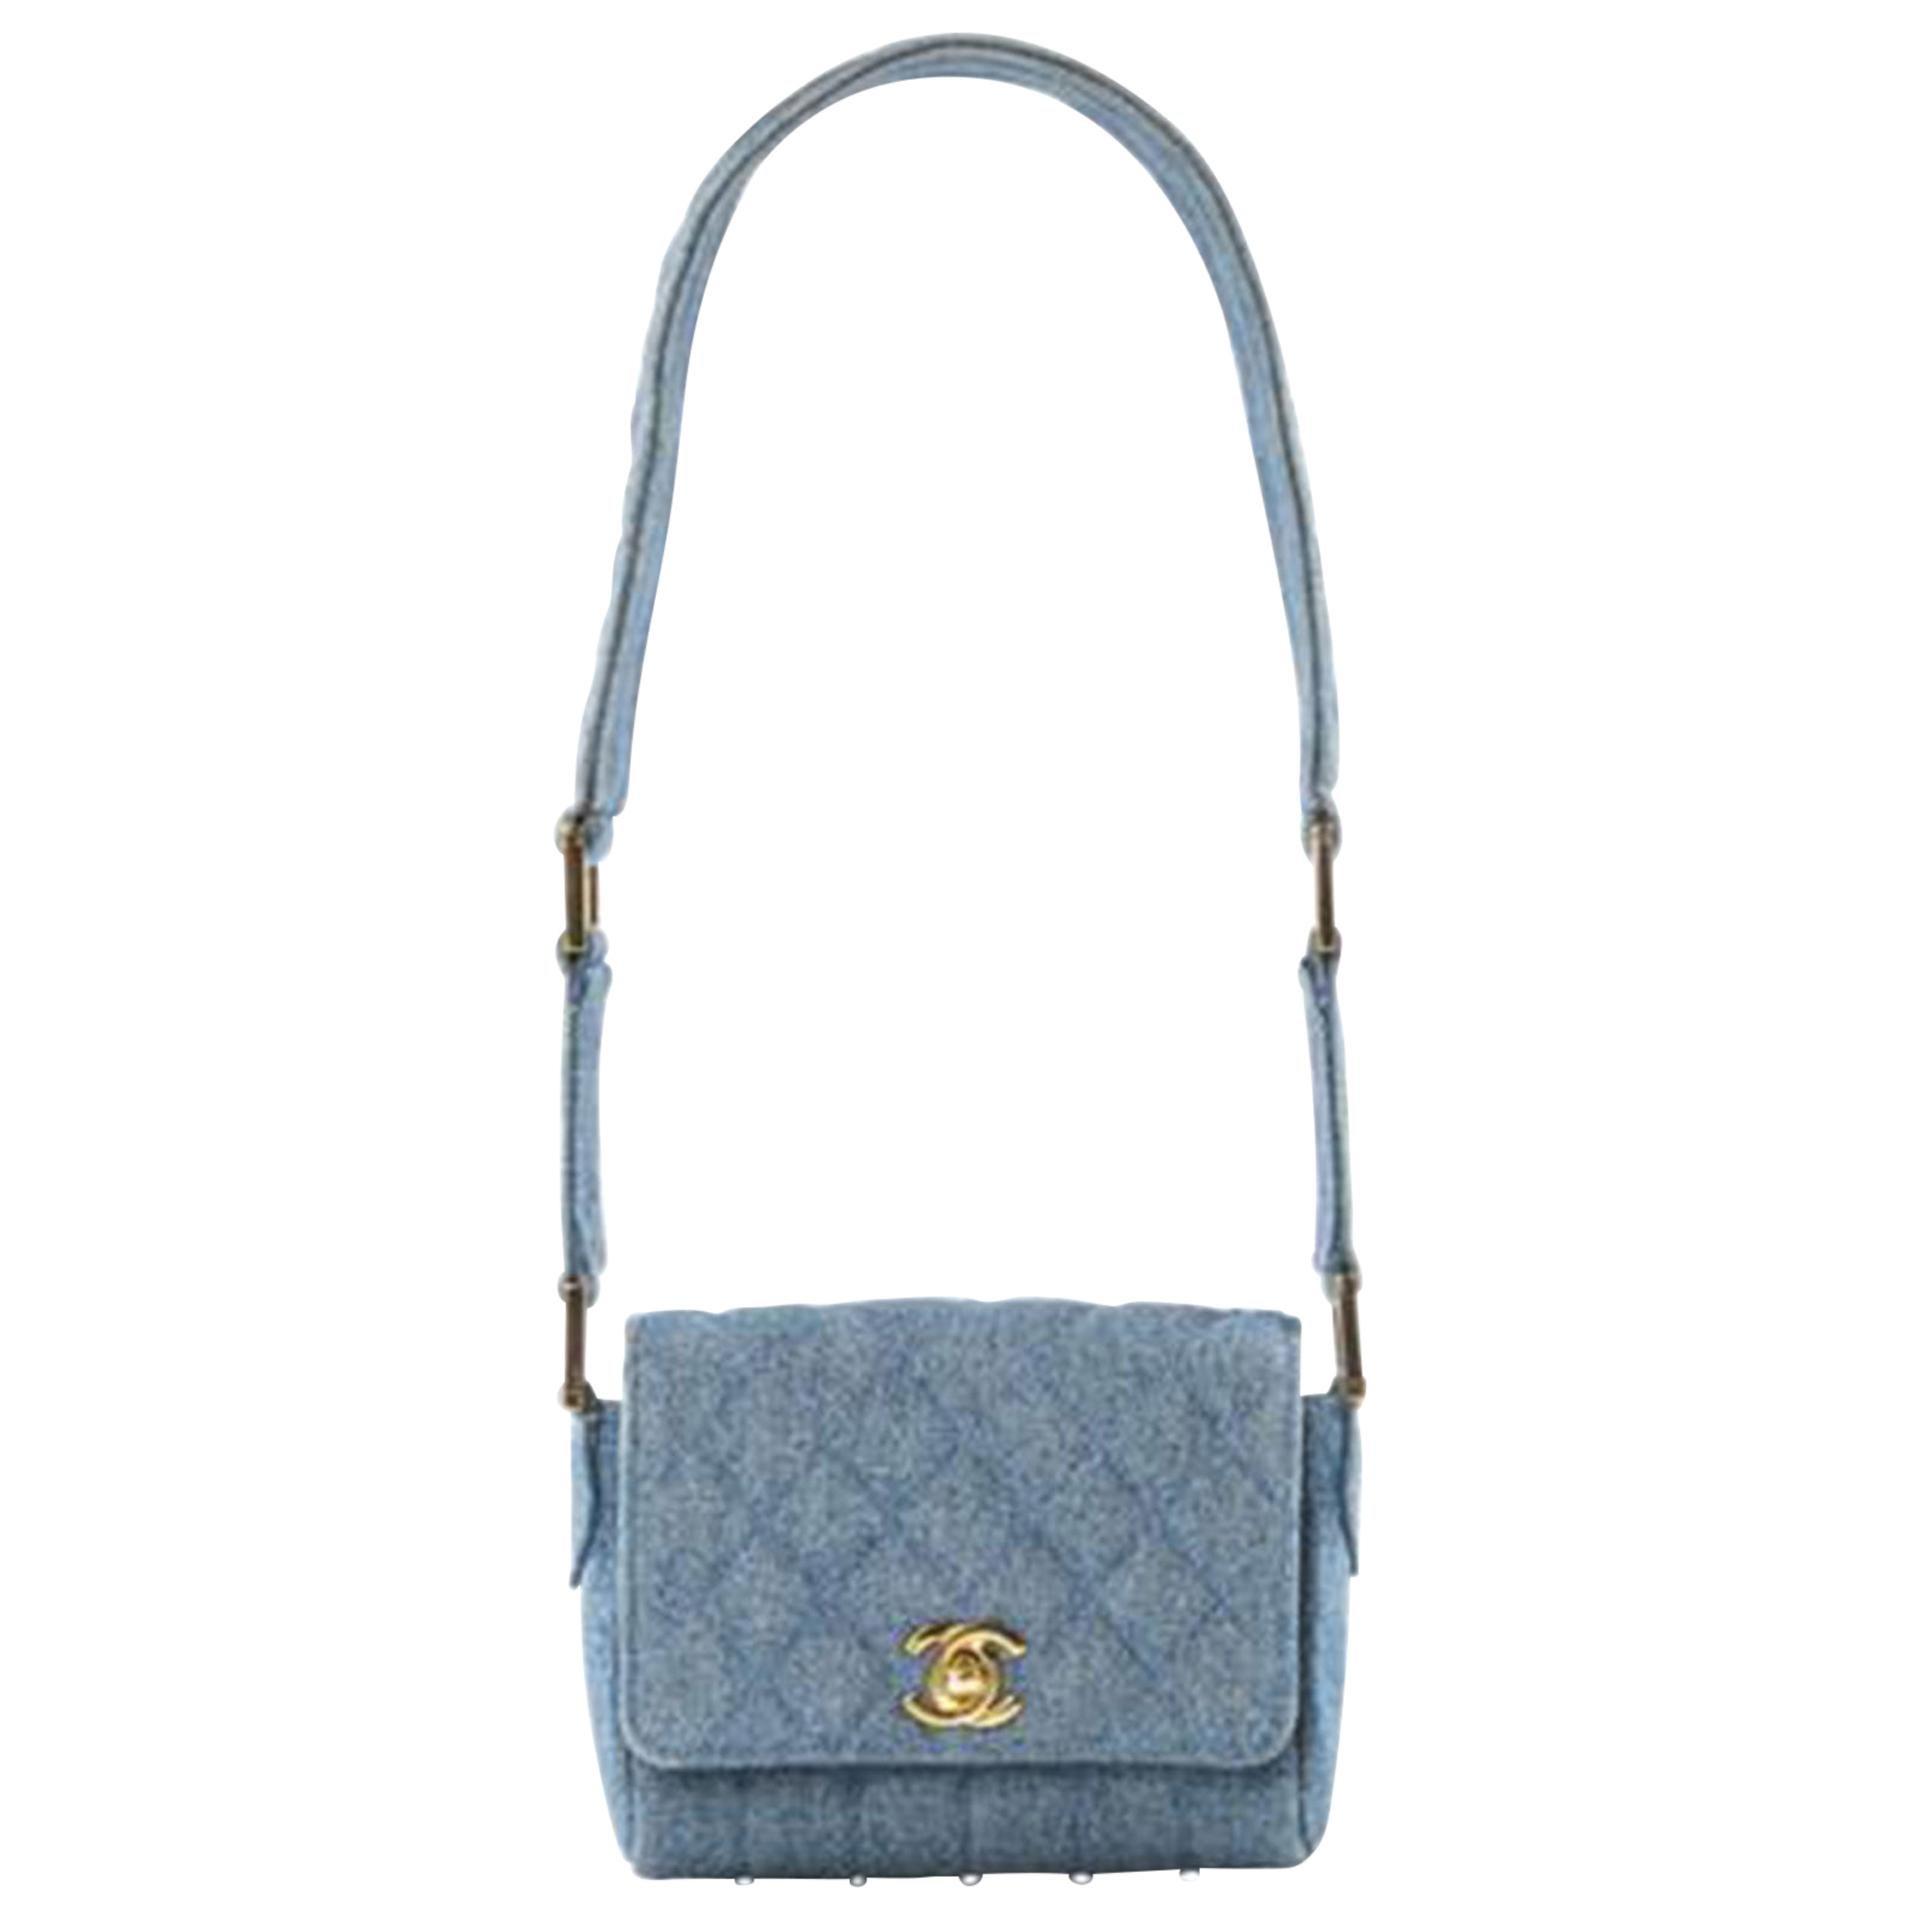 Chanel Minaudière Classic Flap 90s Vintage Runway Micro Mini Jean Blue Denim Bag